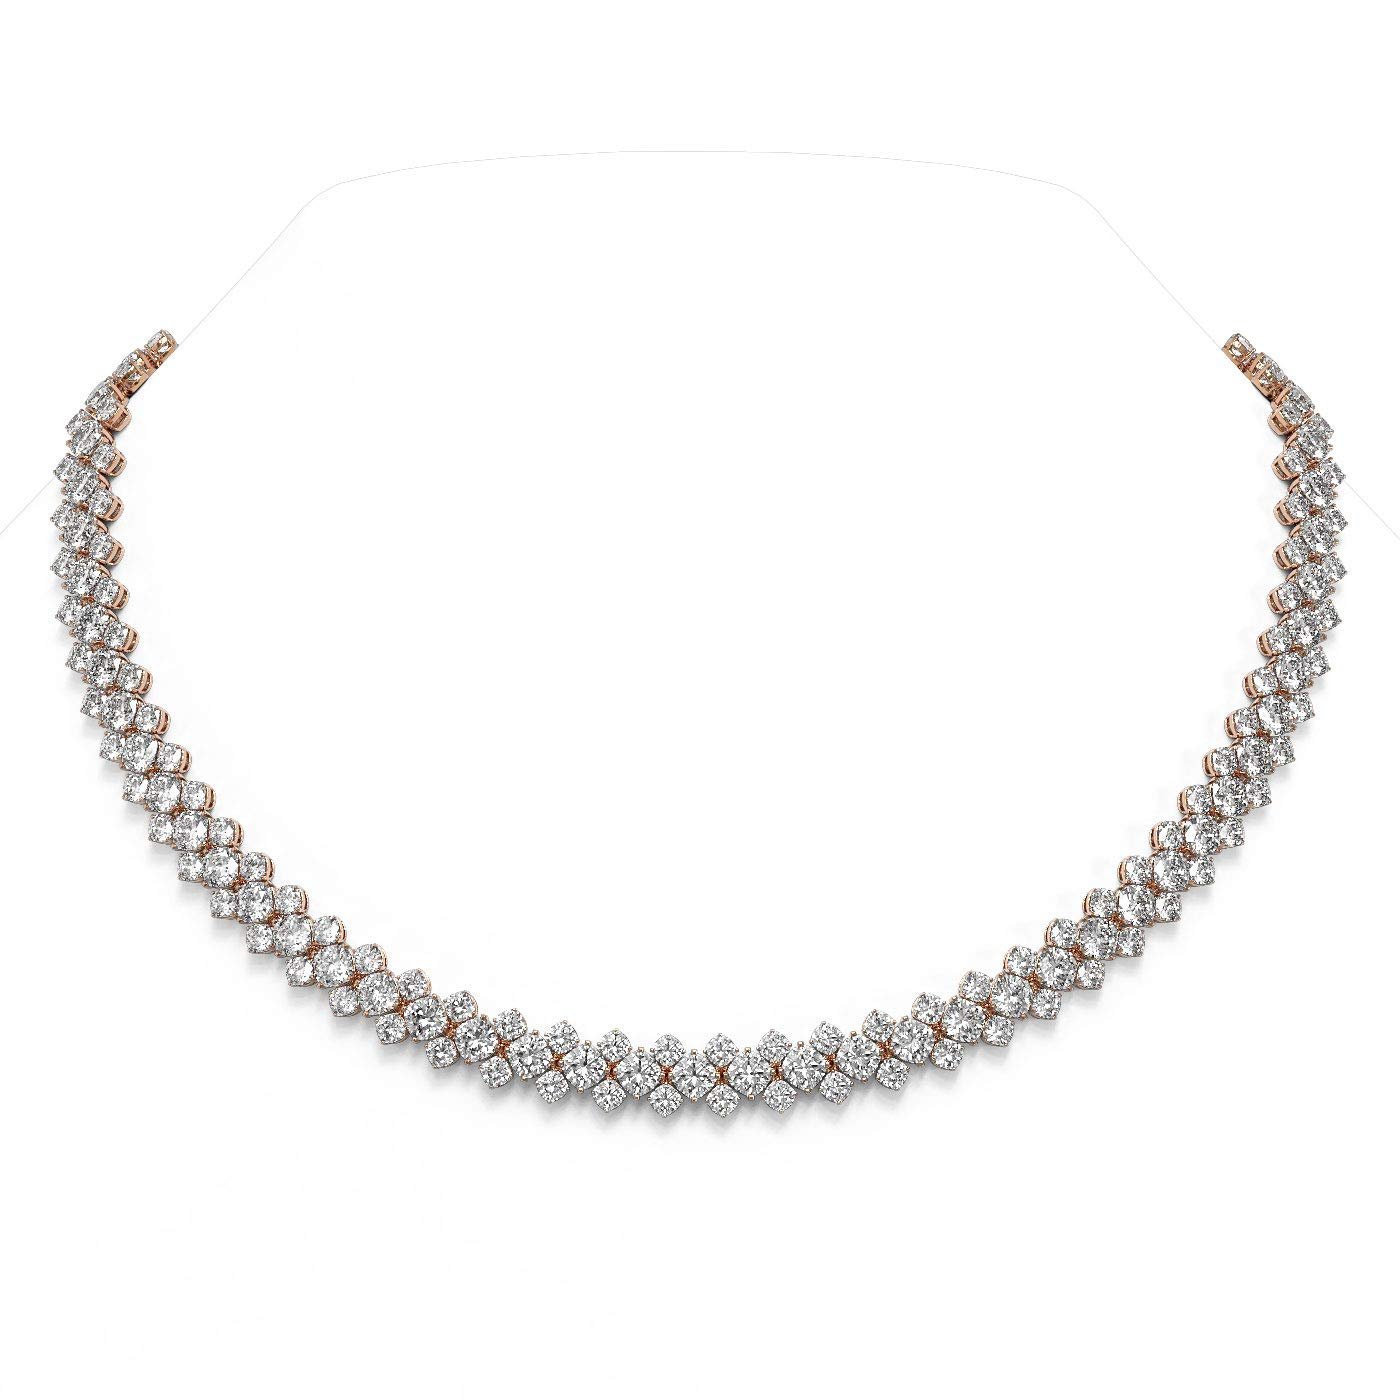 60.5 ctw Cushion Cut Max 44% OFF Cheap mail order sales Diamond Designer Necklace 18K